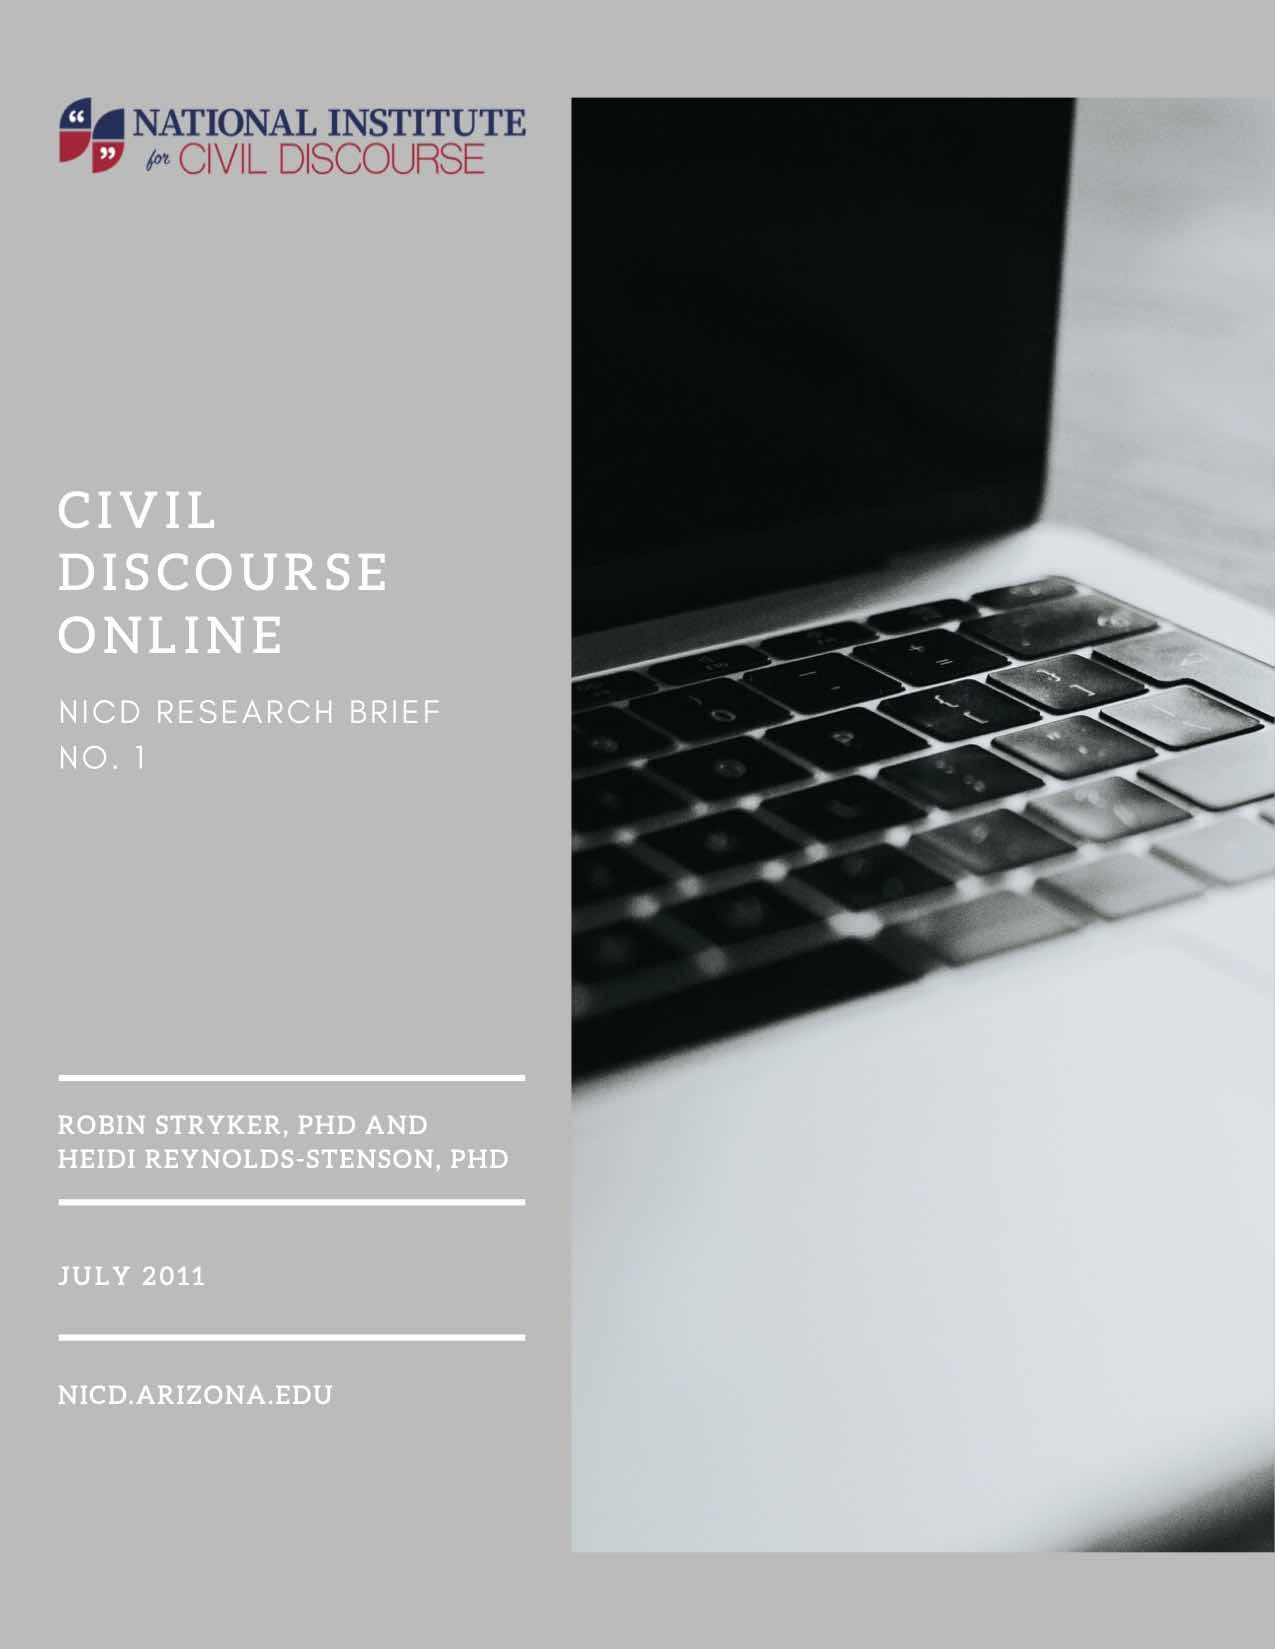 NICD Research Brief 1: Civil Discourse Online